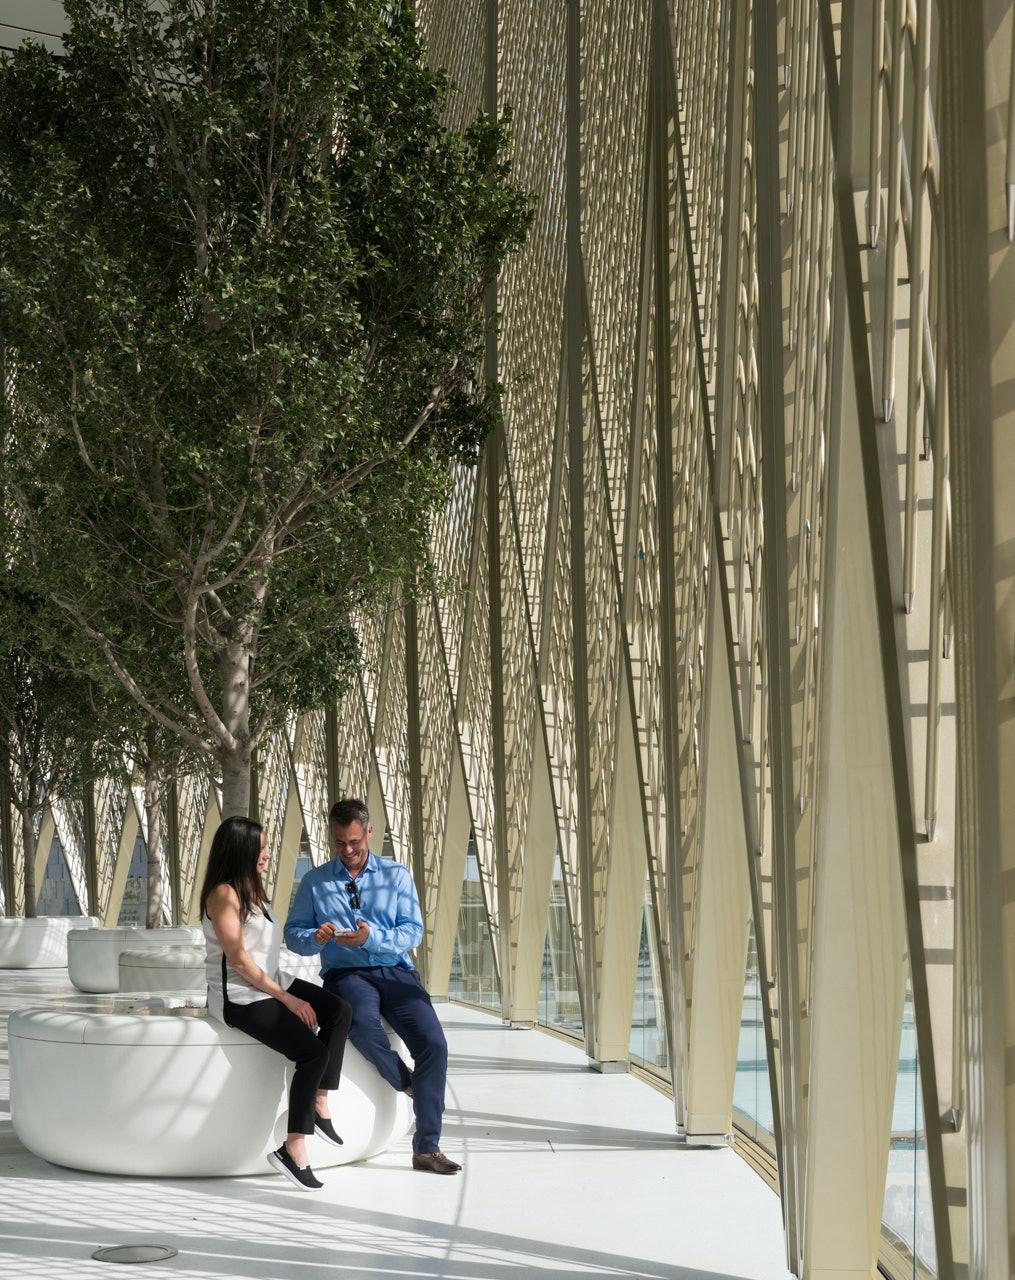 The trees provide a beautiful seating area.